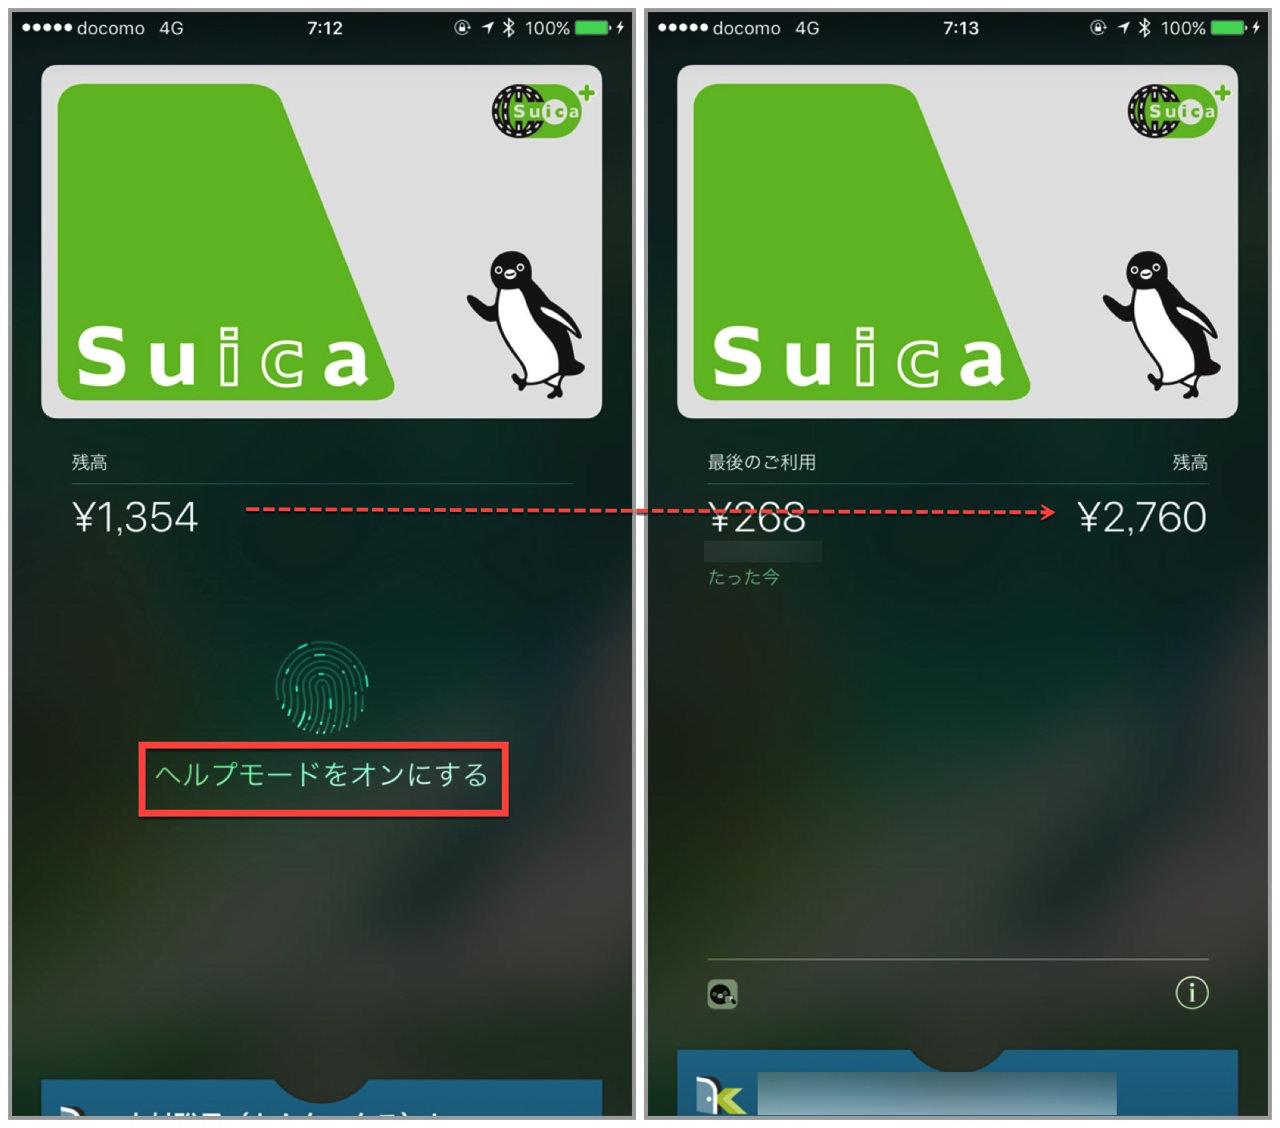 Suica update balance2